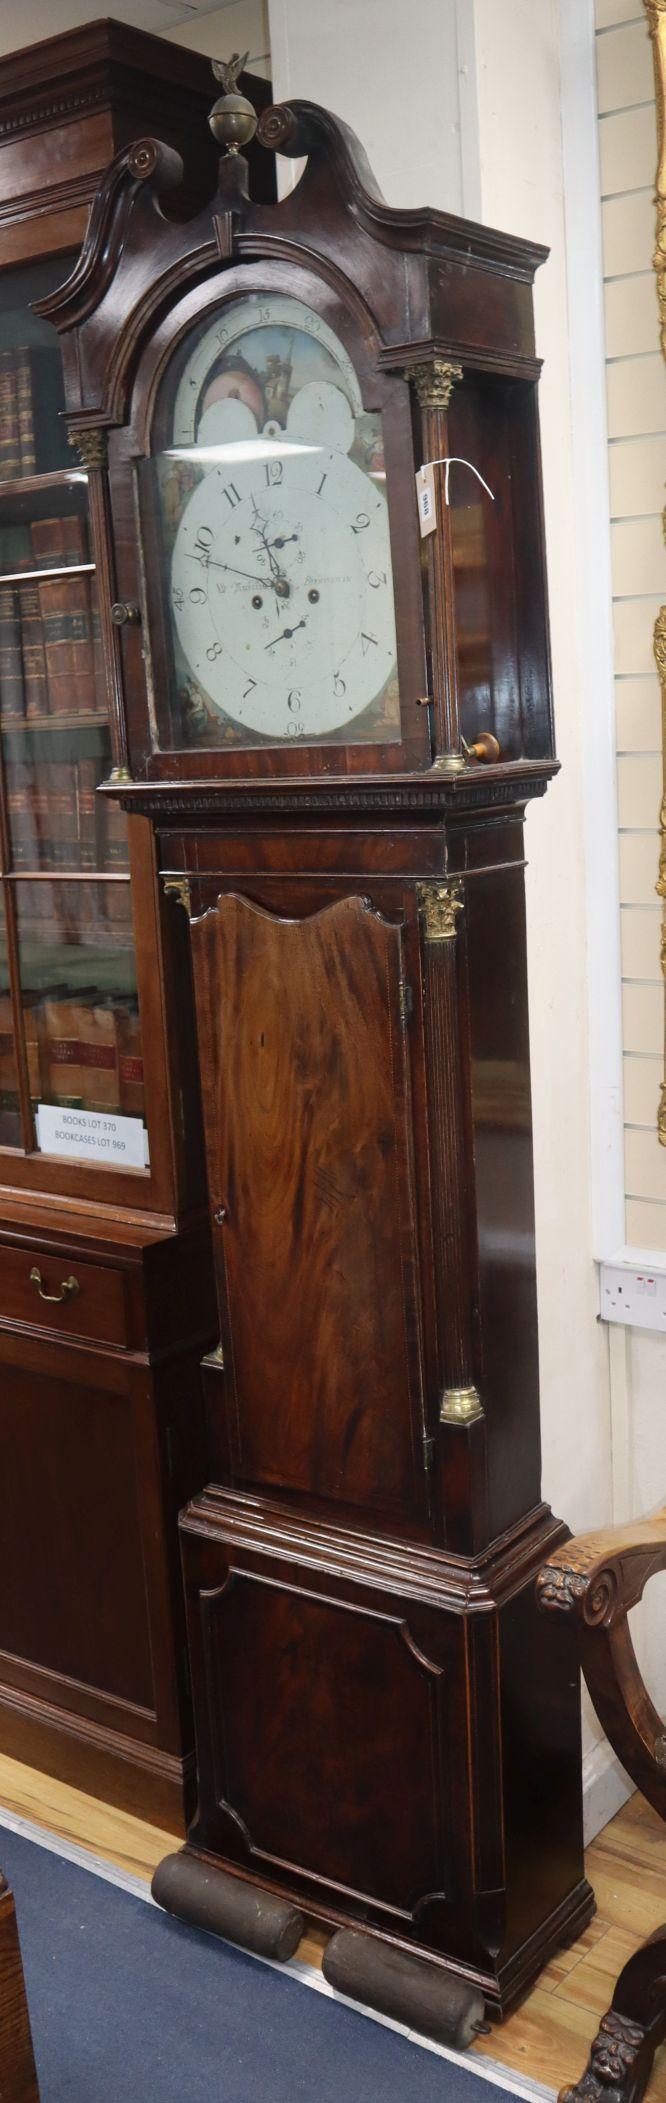 Lot 968 - Nicholas of Birmingham. A George III mahogany eight day longcase clock H.230cm